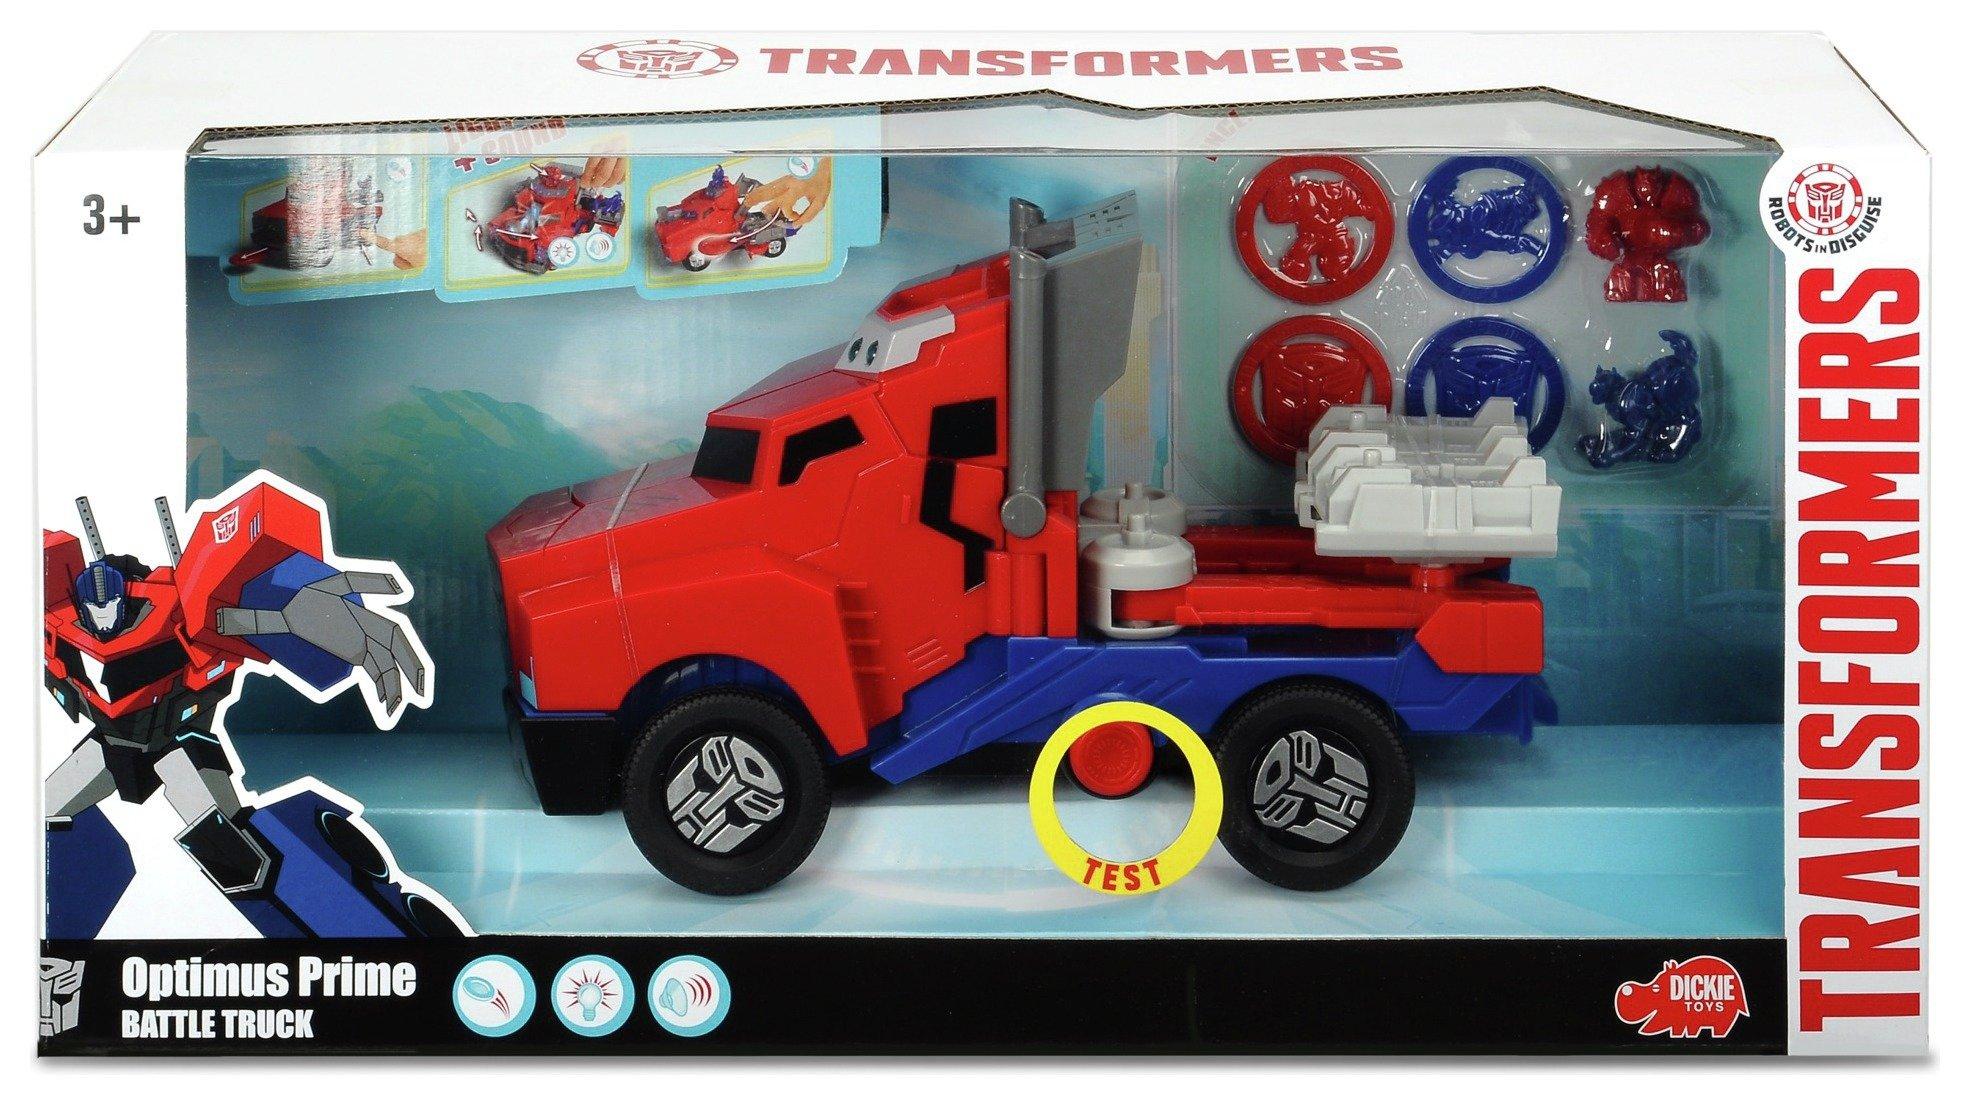 Image of Dickie Opitmus Prime Battle Truck